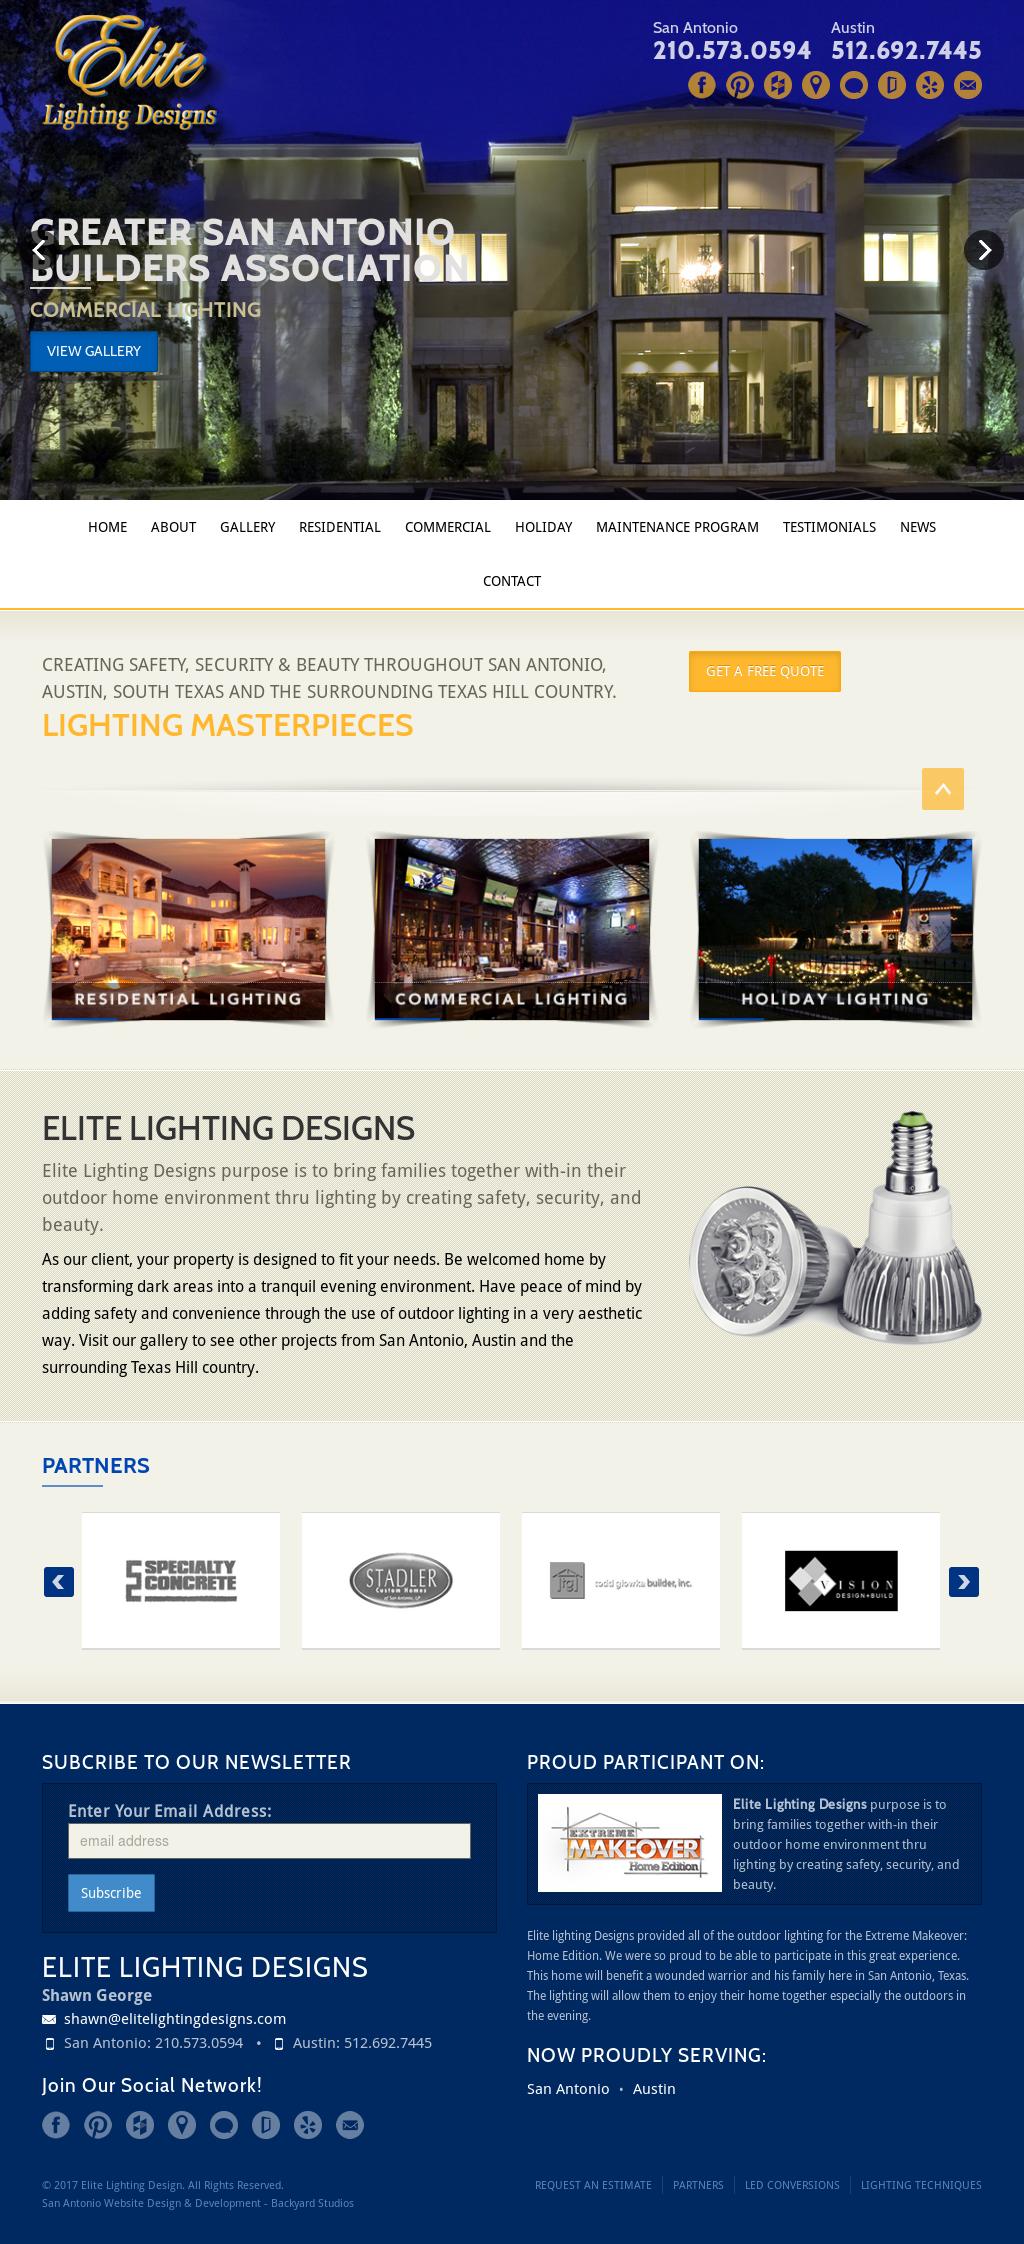 Elite Lighting Designs S Latest News